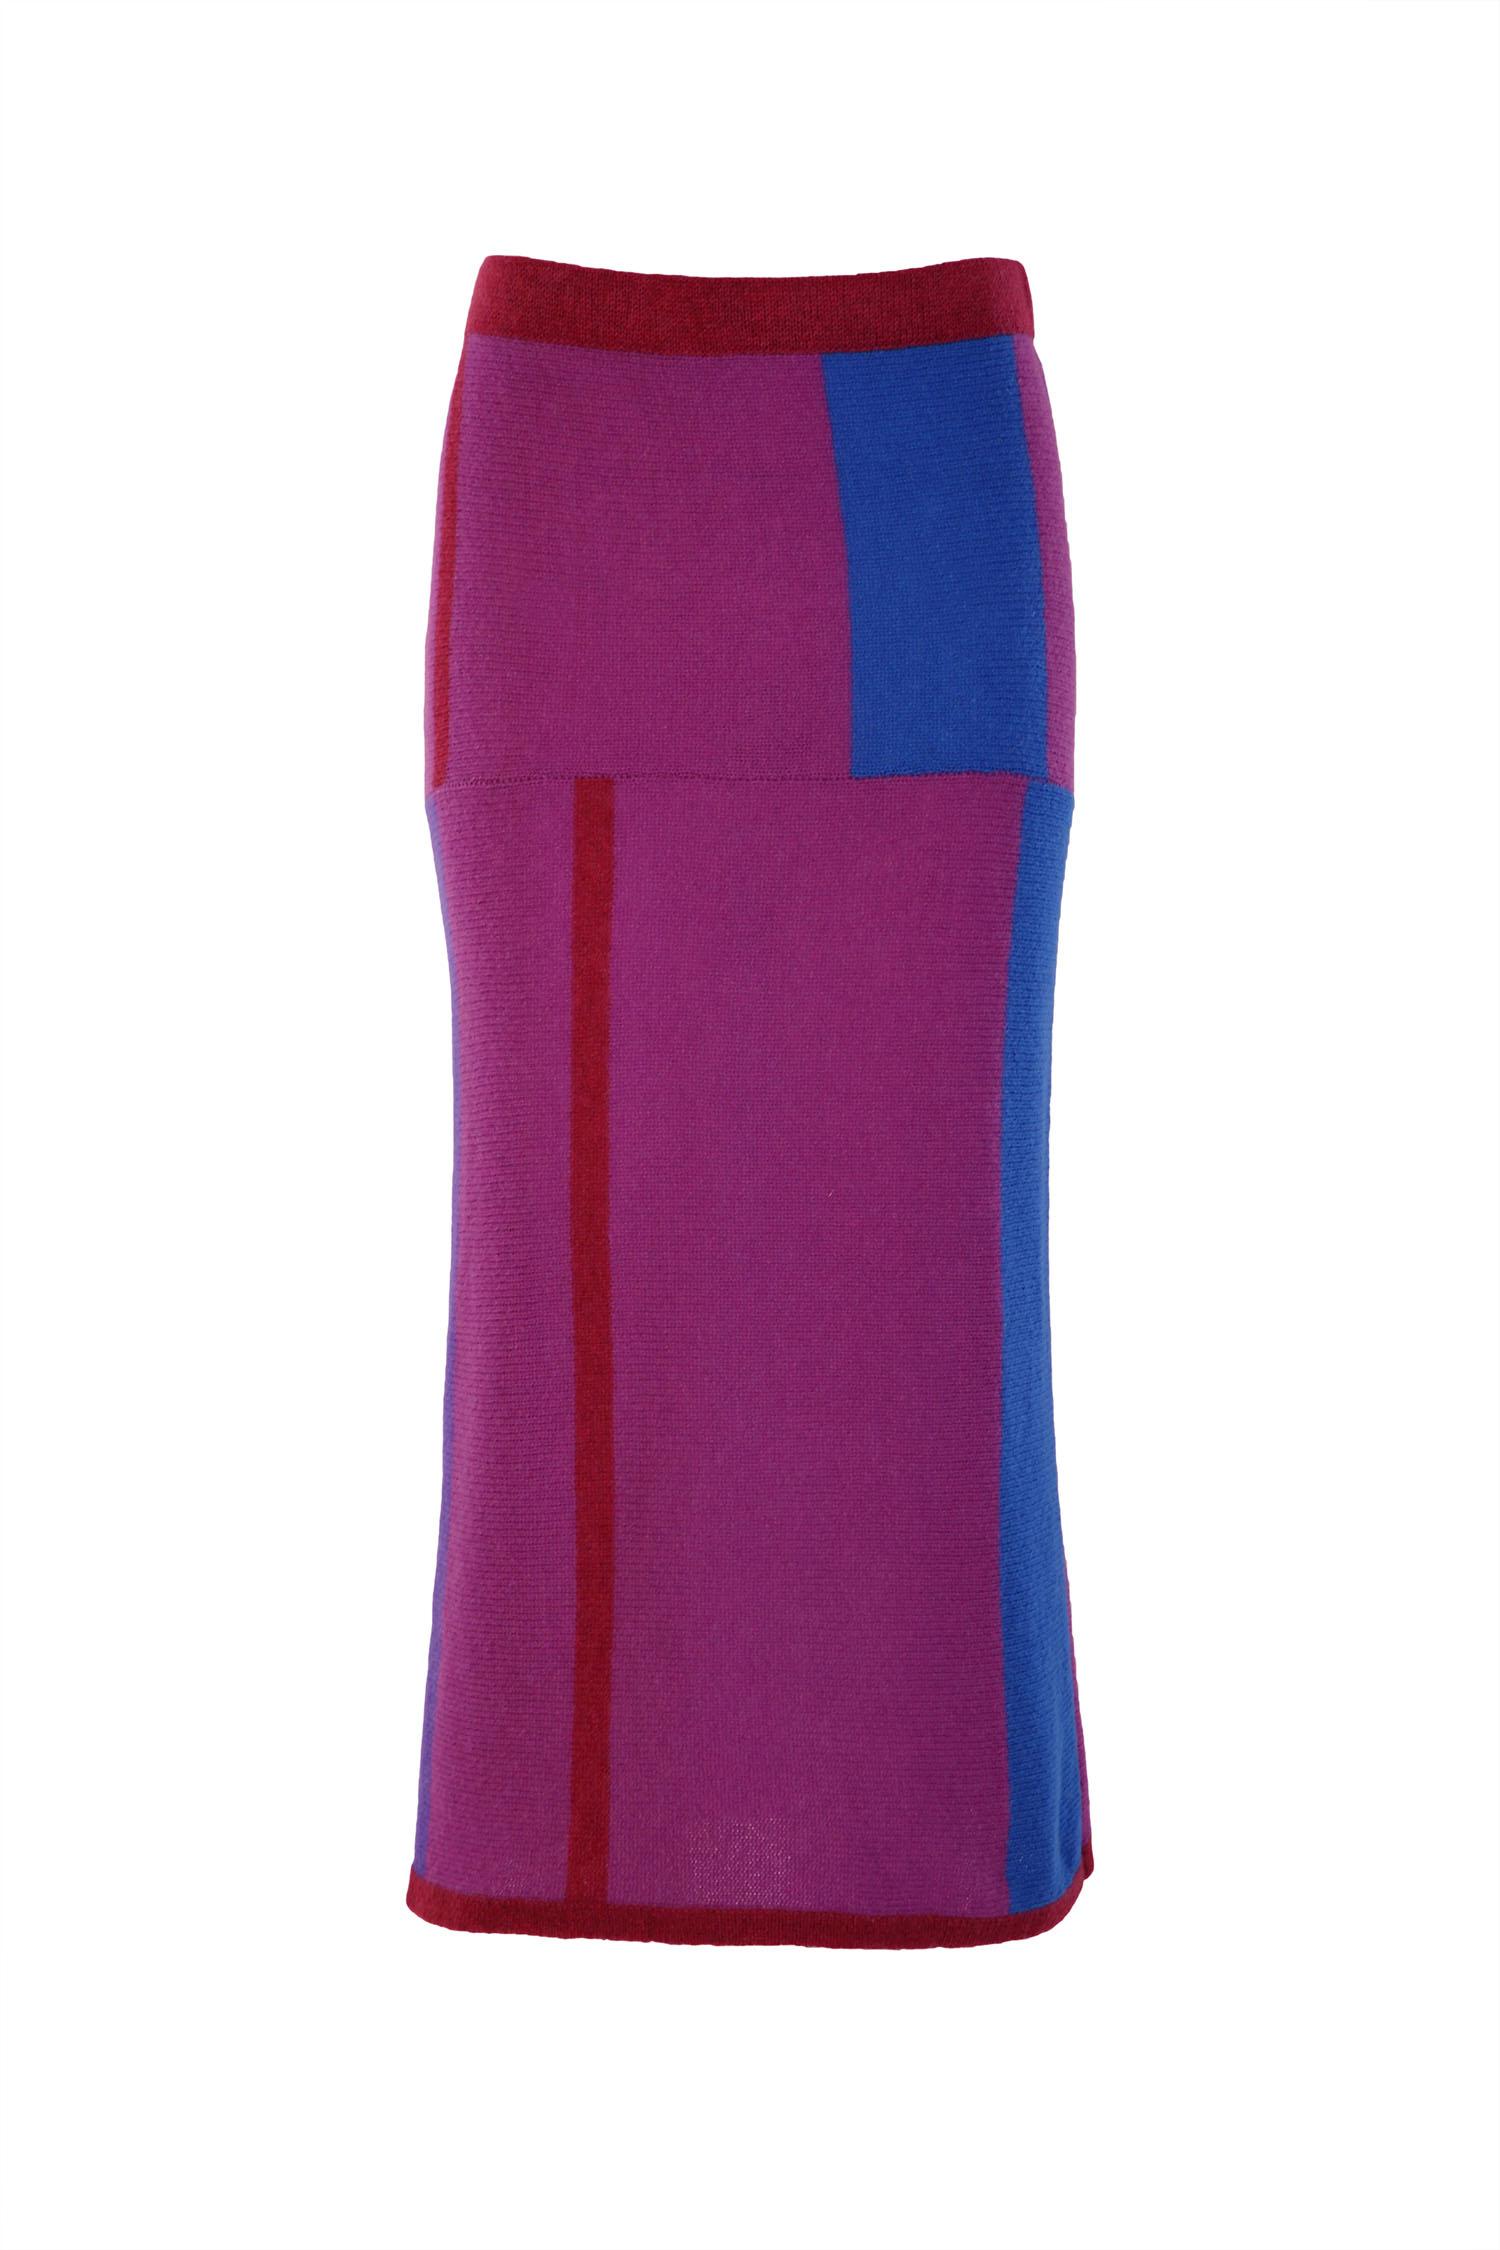 Mondrian pencil skirt2